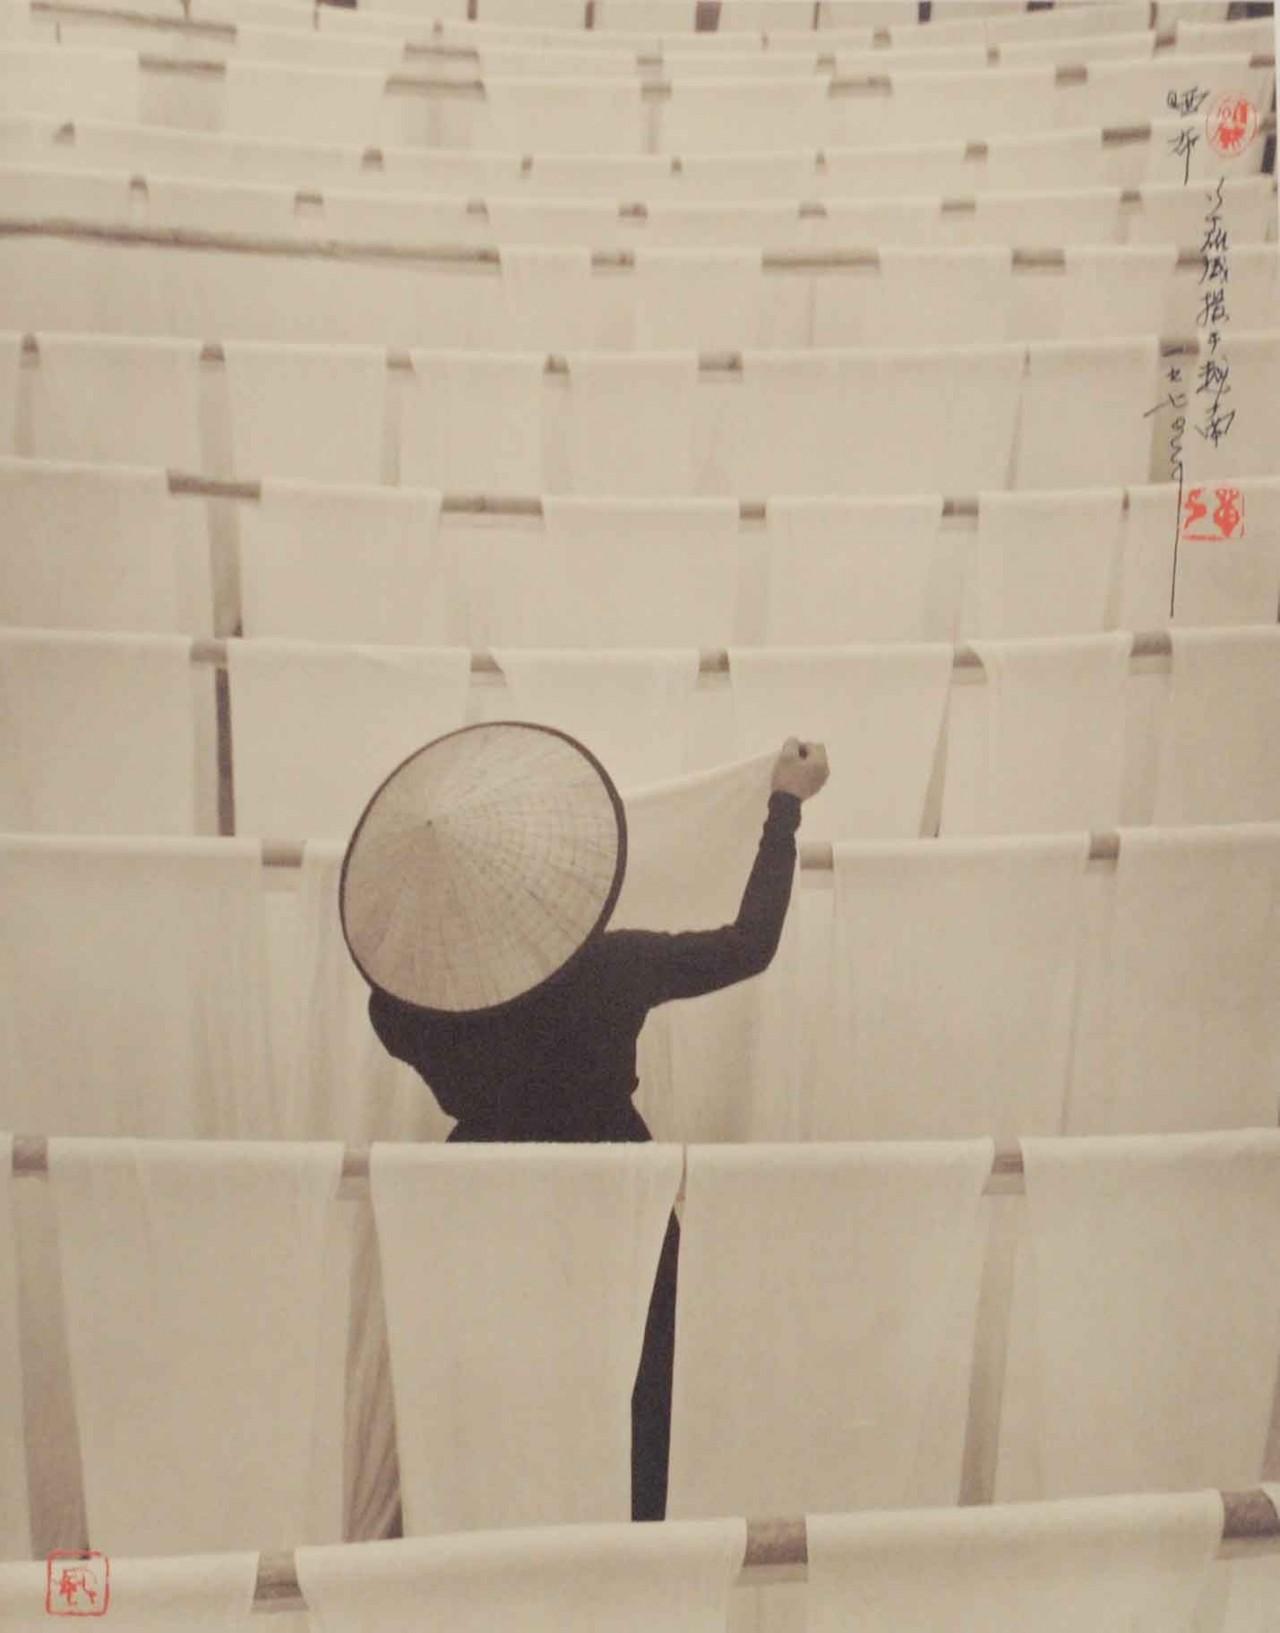 Сушка ткани, 1964. Автор Дон Хонг-Оай